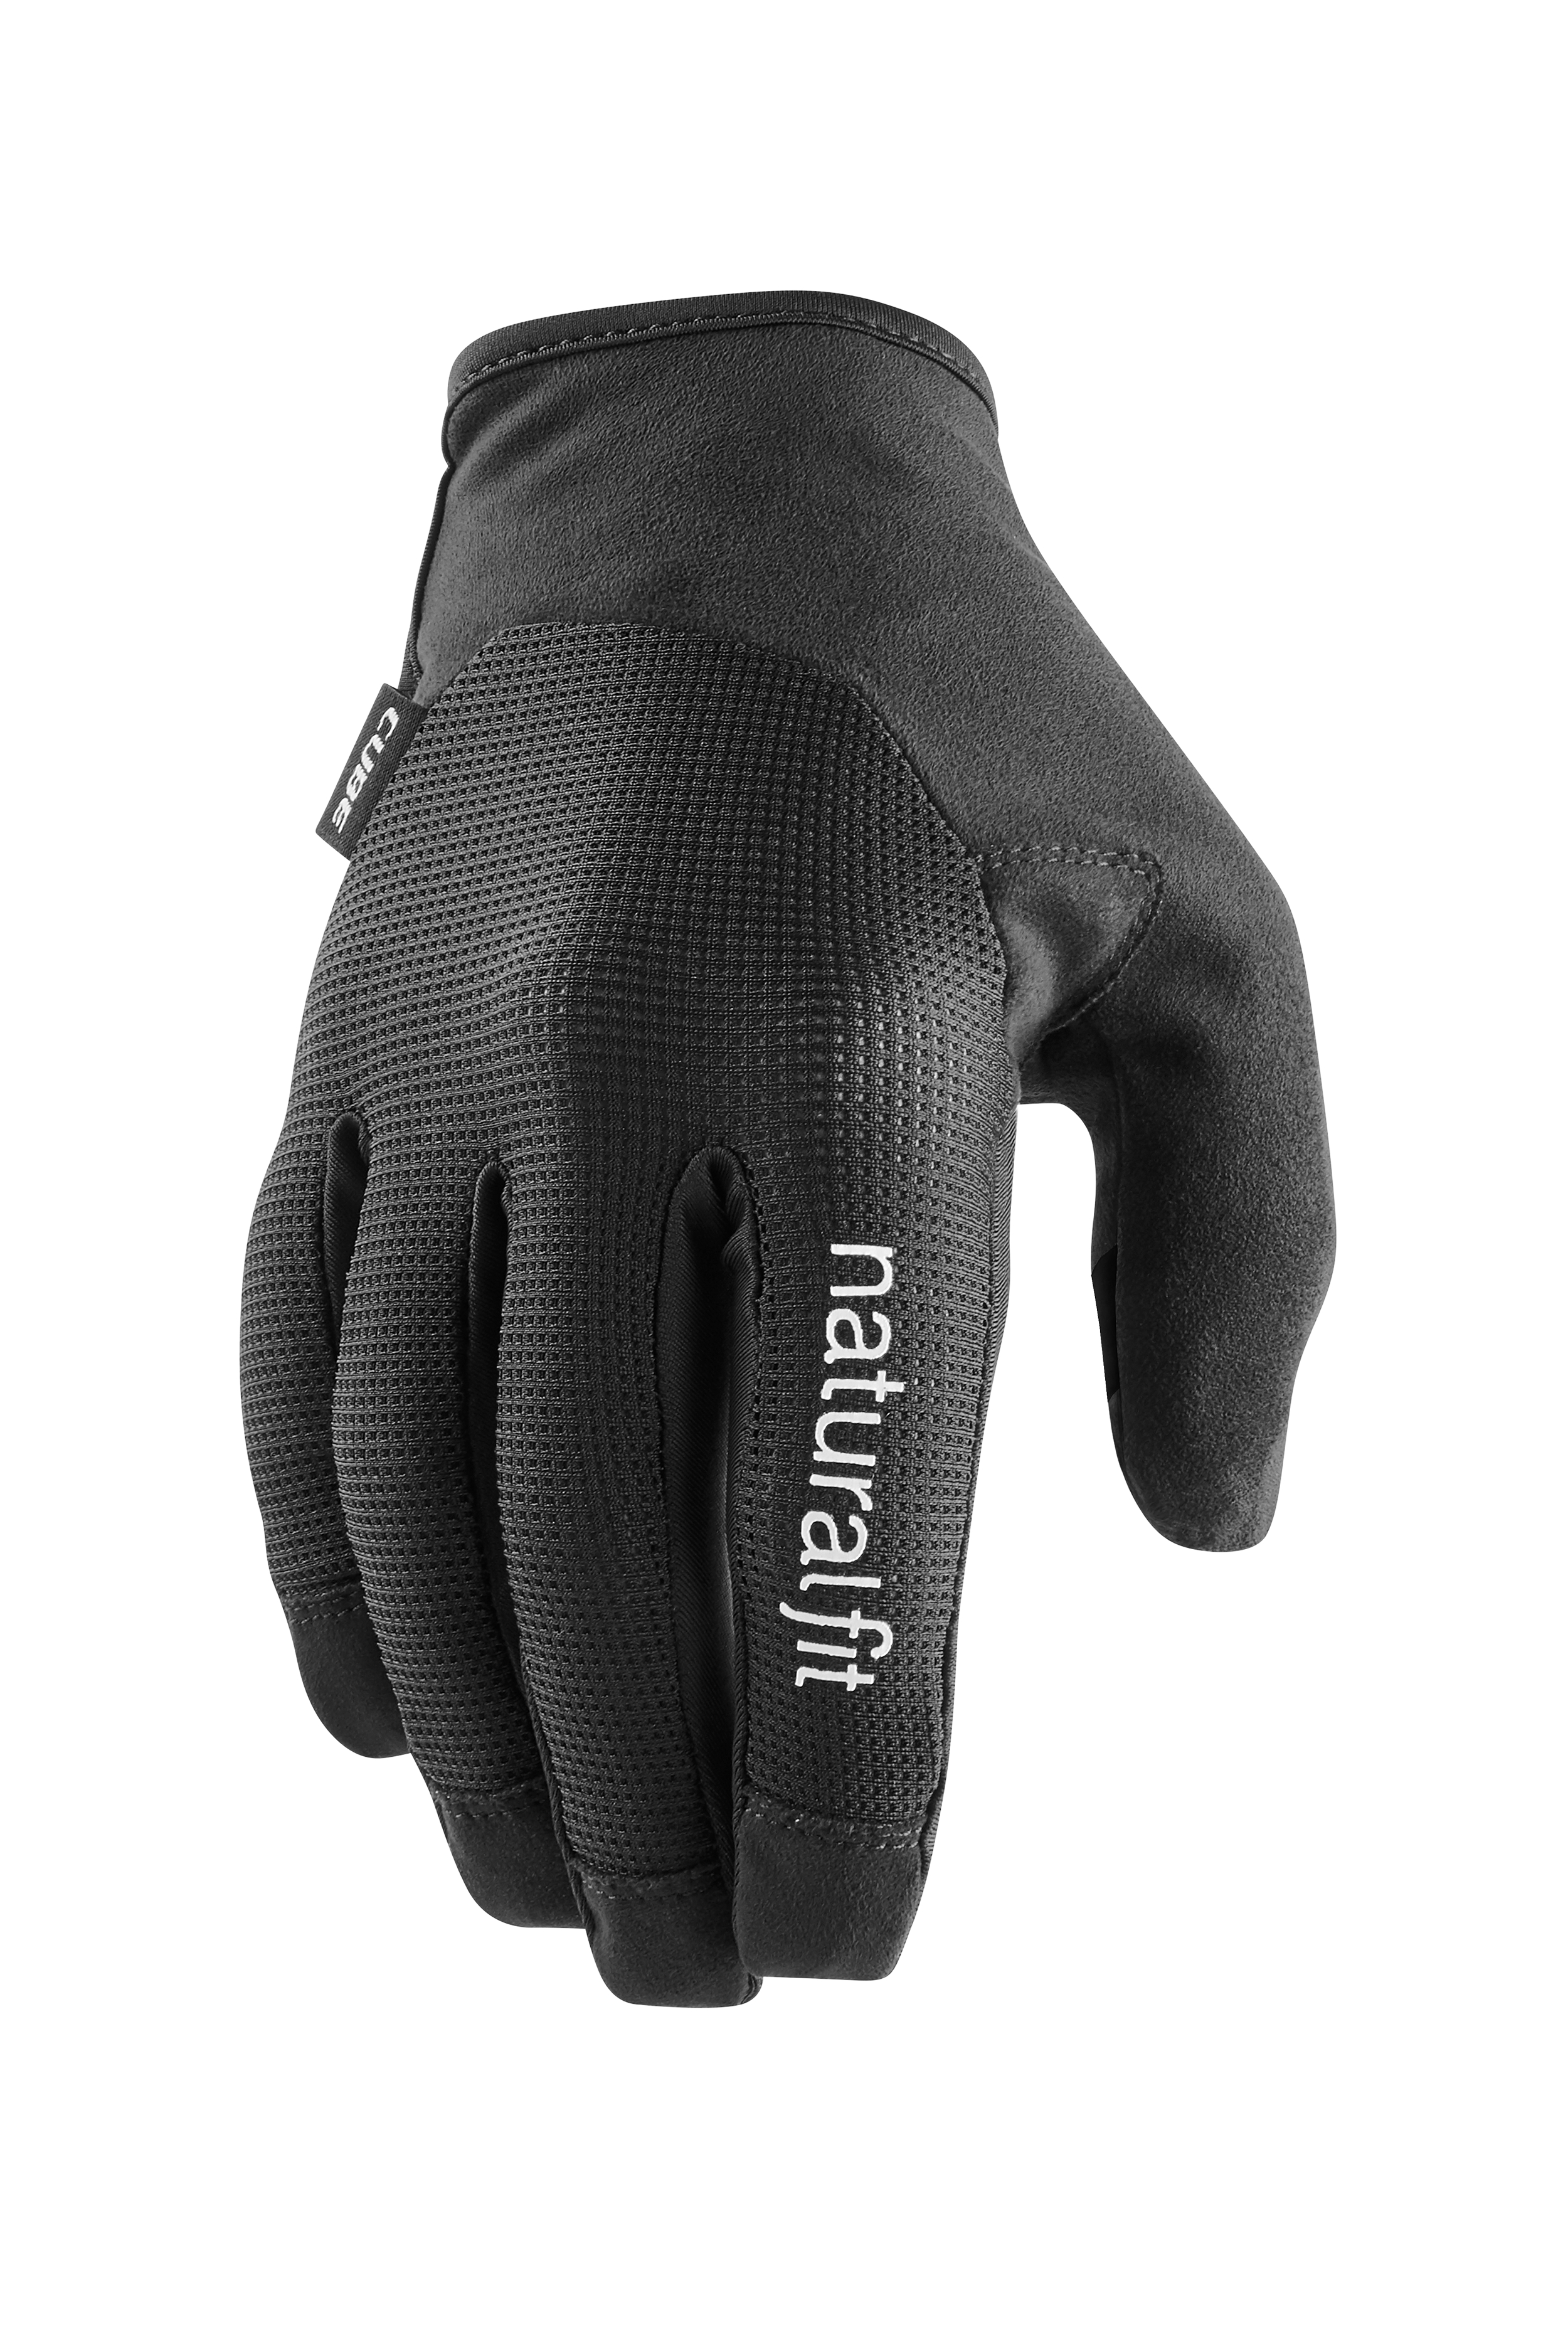 Cube Handschuhe langfinger X NF black